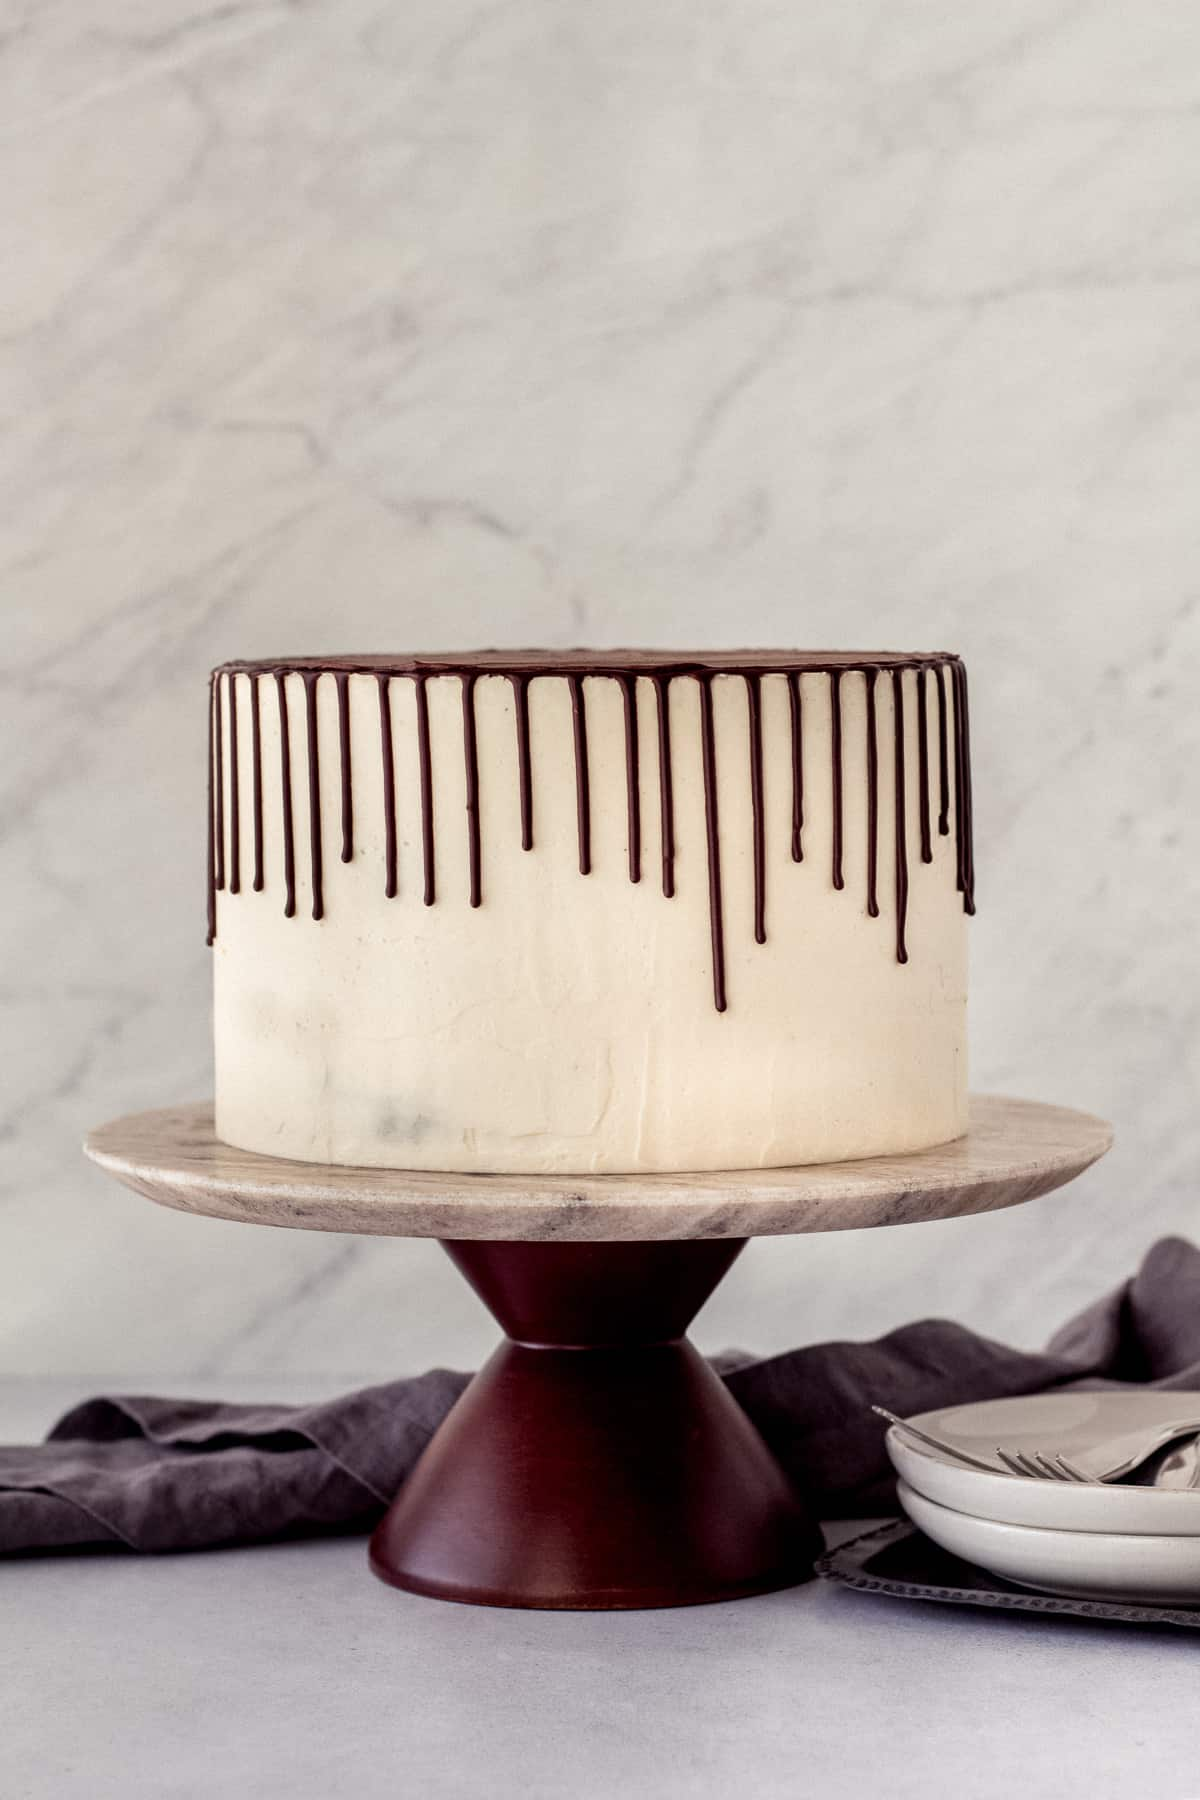 Chocolate Stout Layer Cake